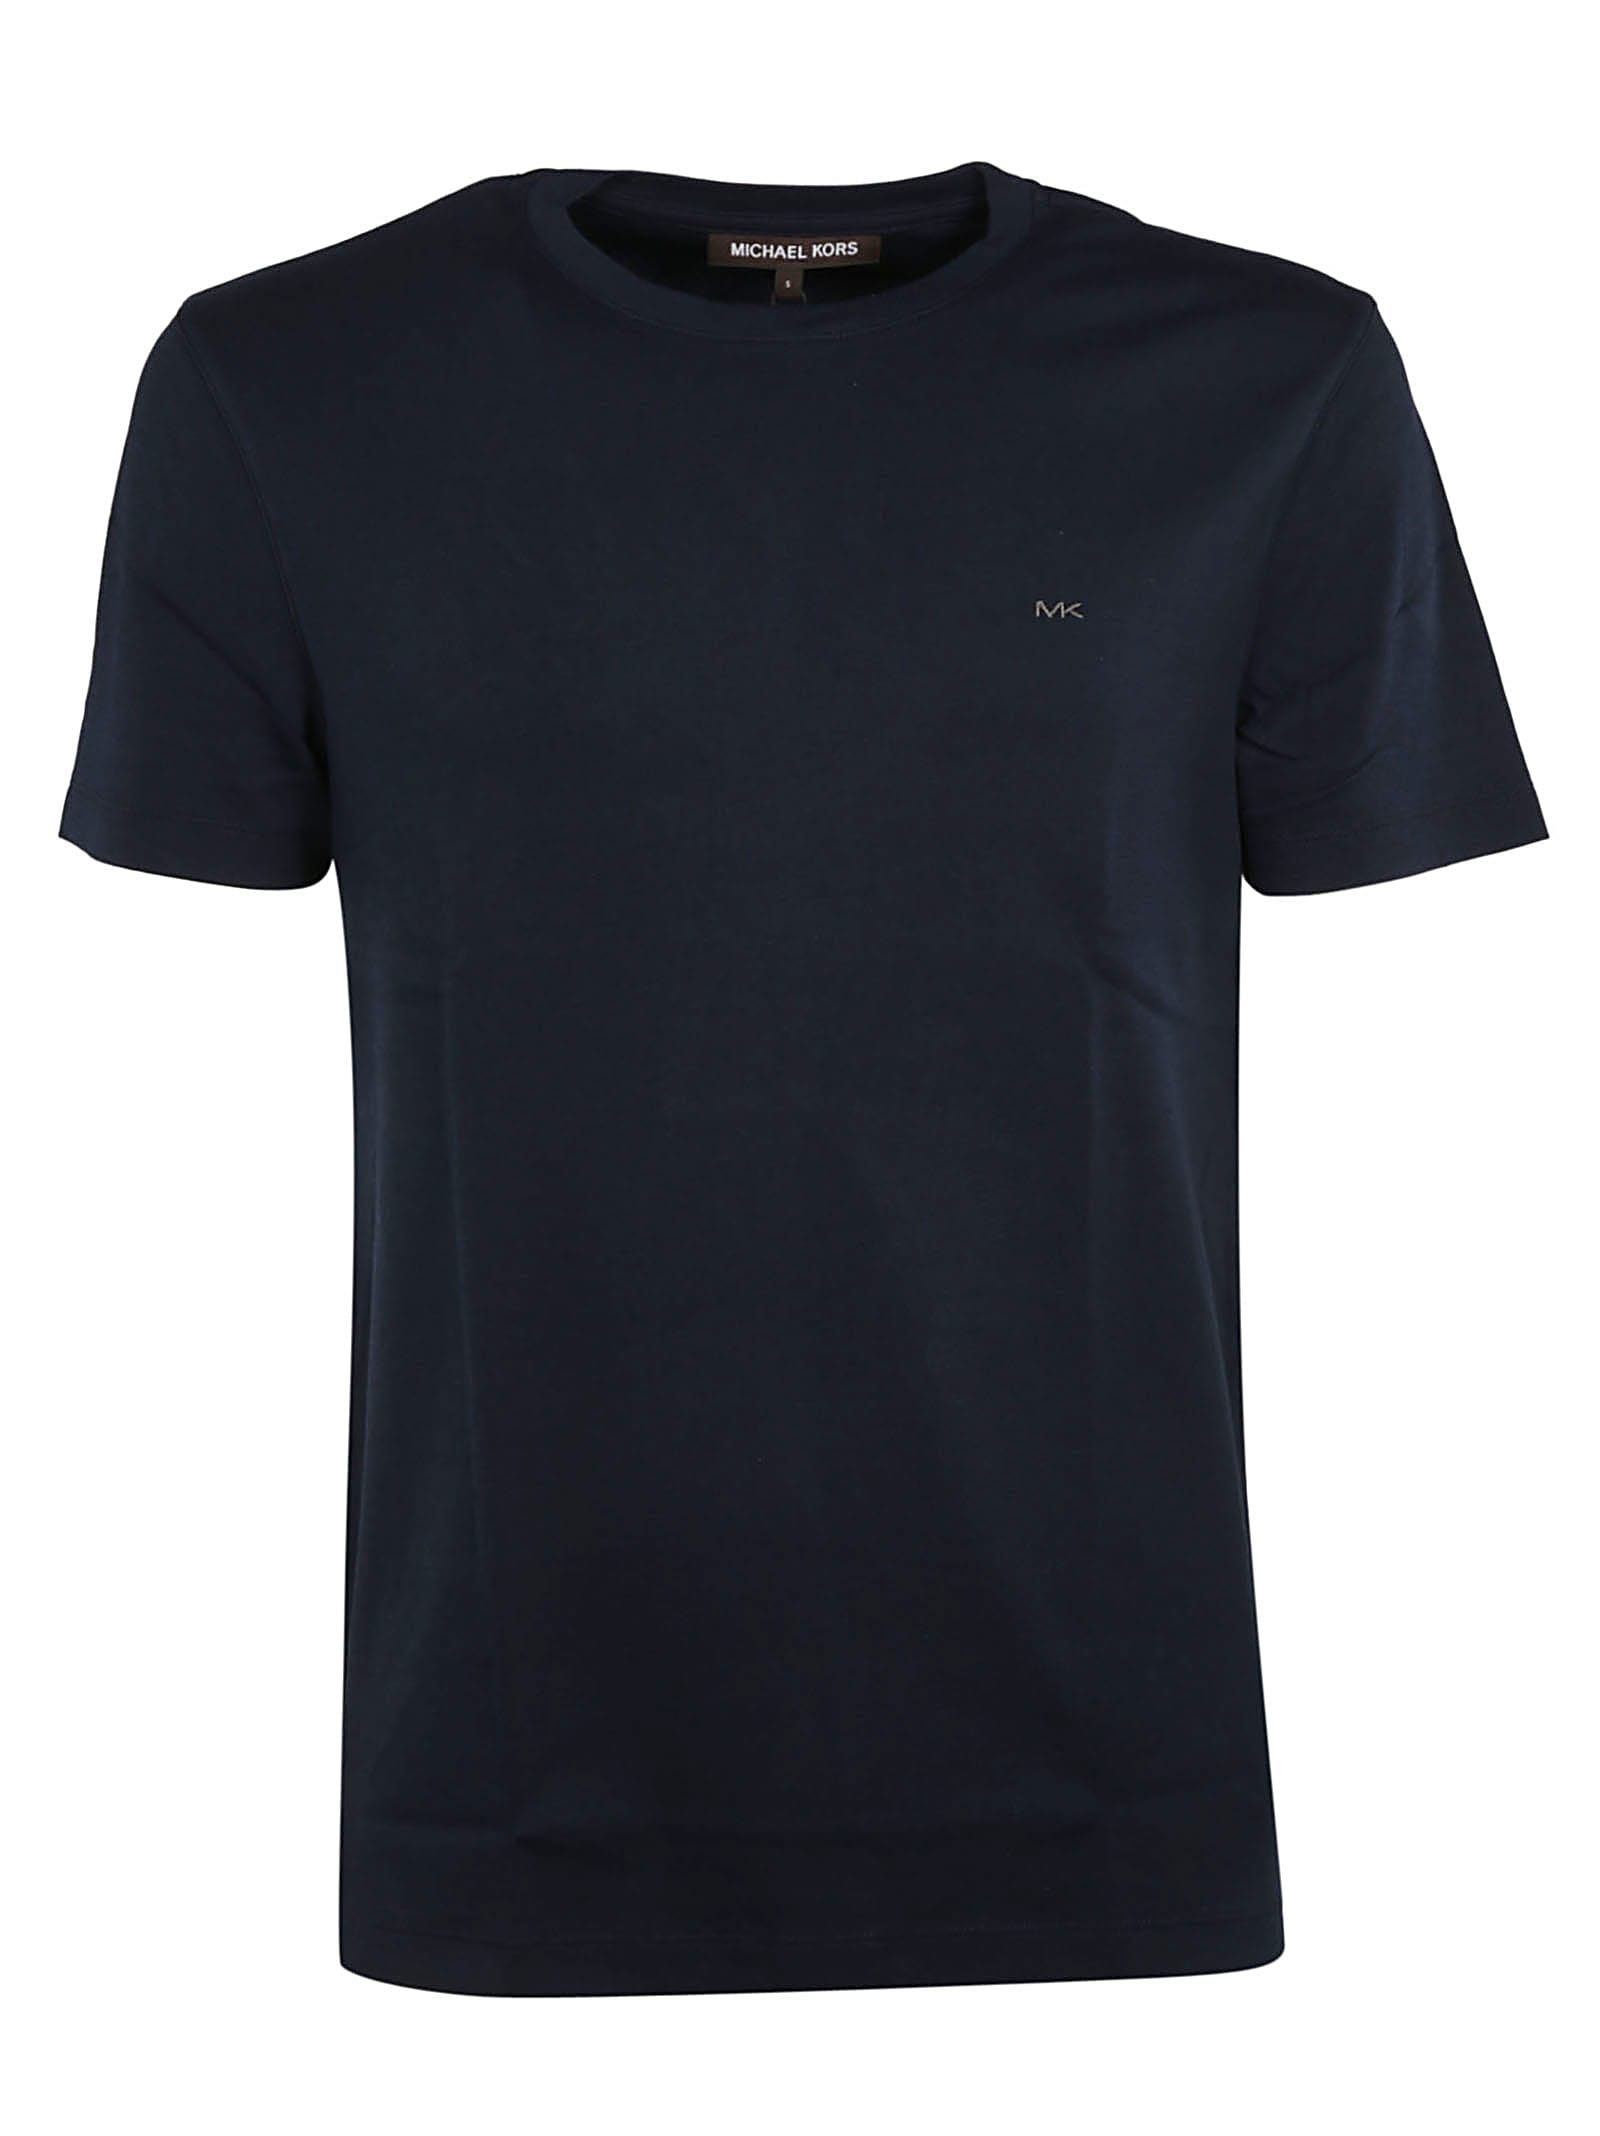 Michael Kors Classic T-shirt